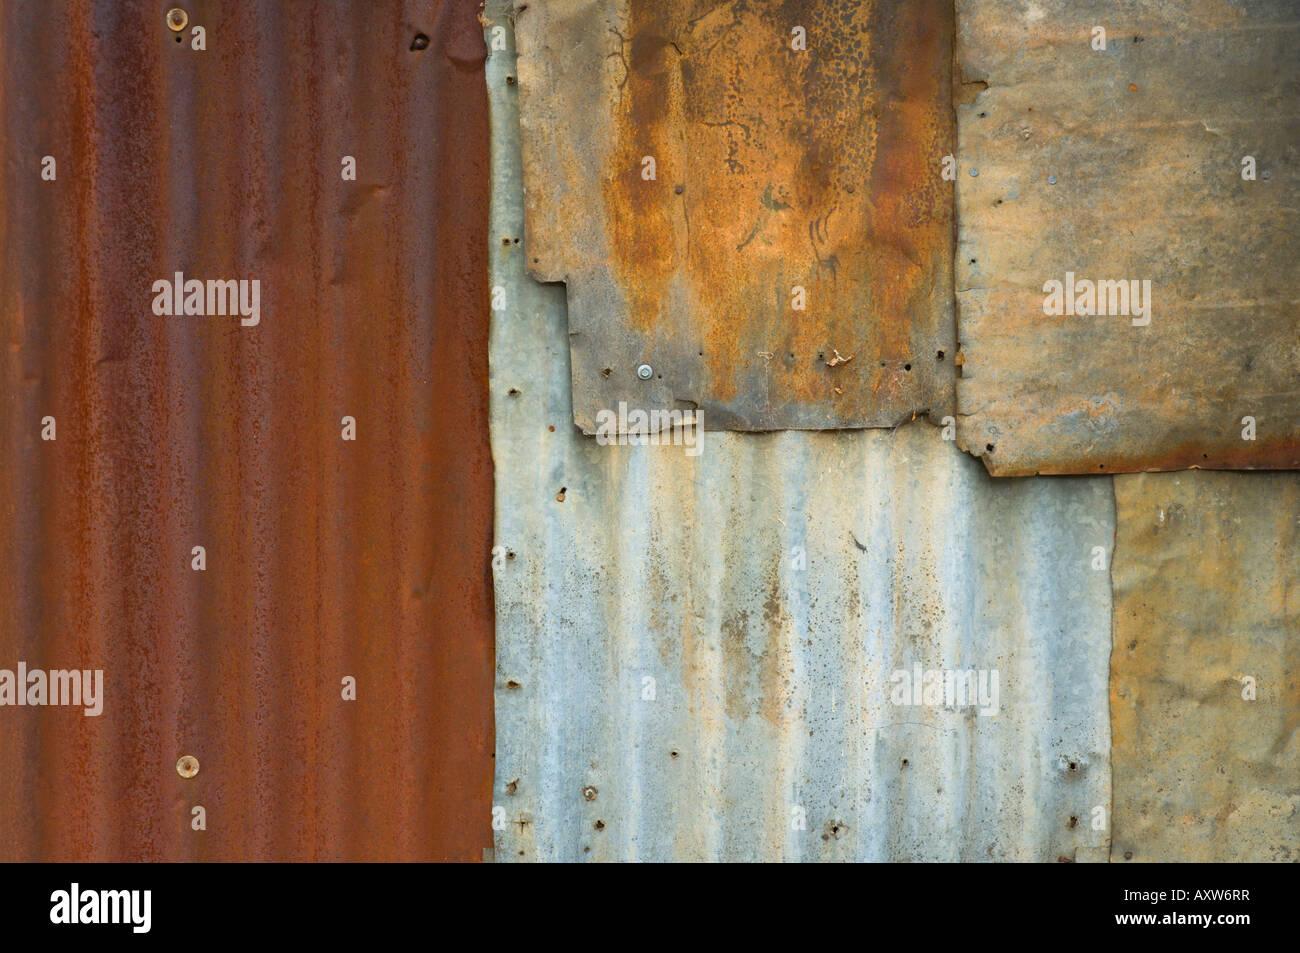 Detail der verlassenen Hütte im historischen Goldgräberstadt, Hill End, New-South.Wales, Australien, Pazifik Stockbild